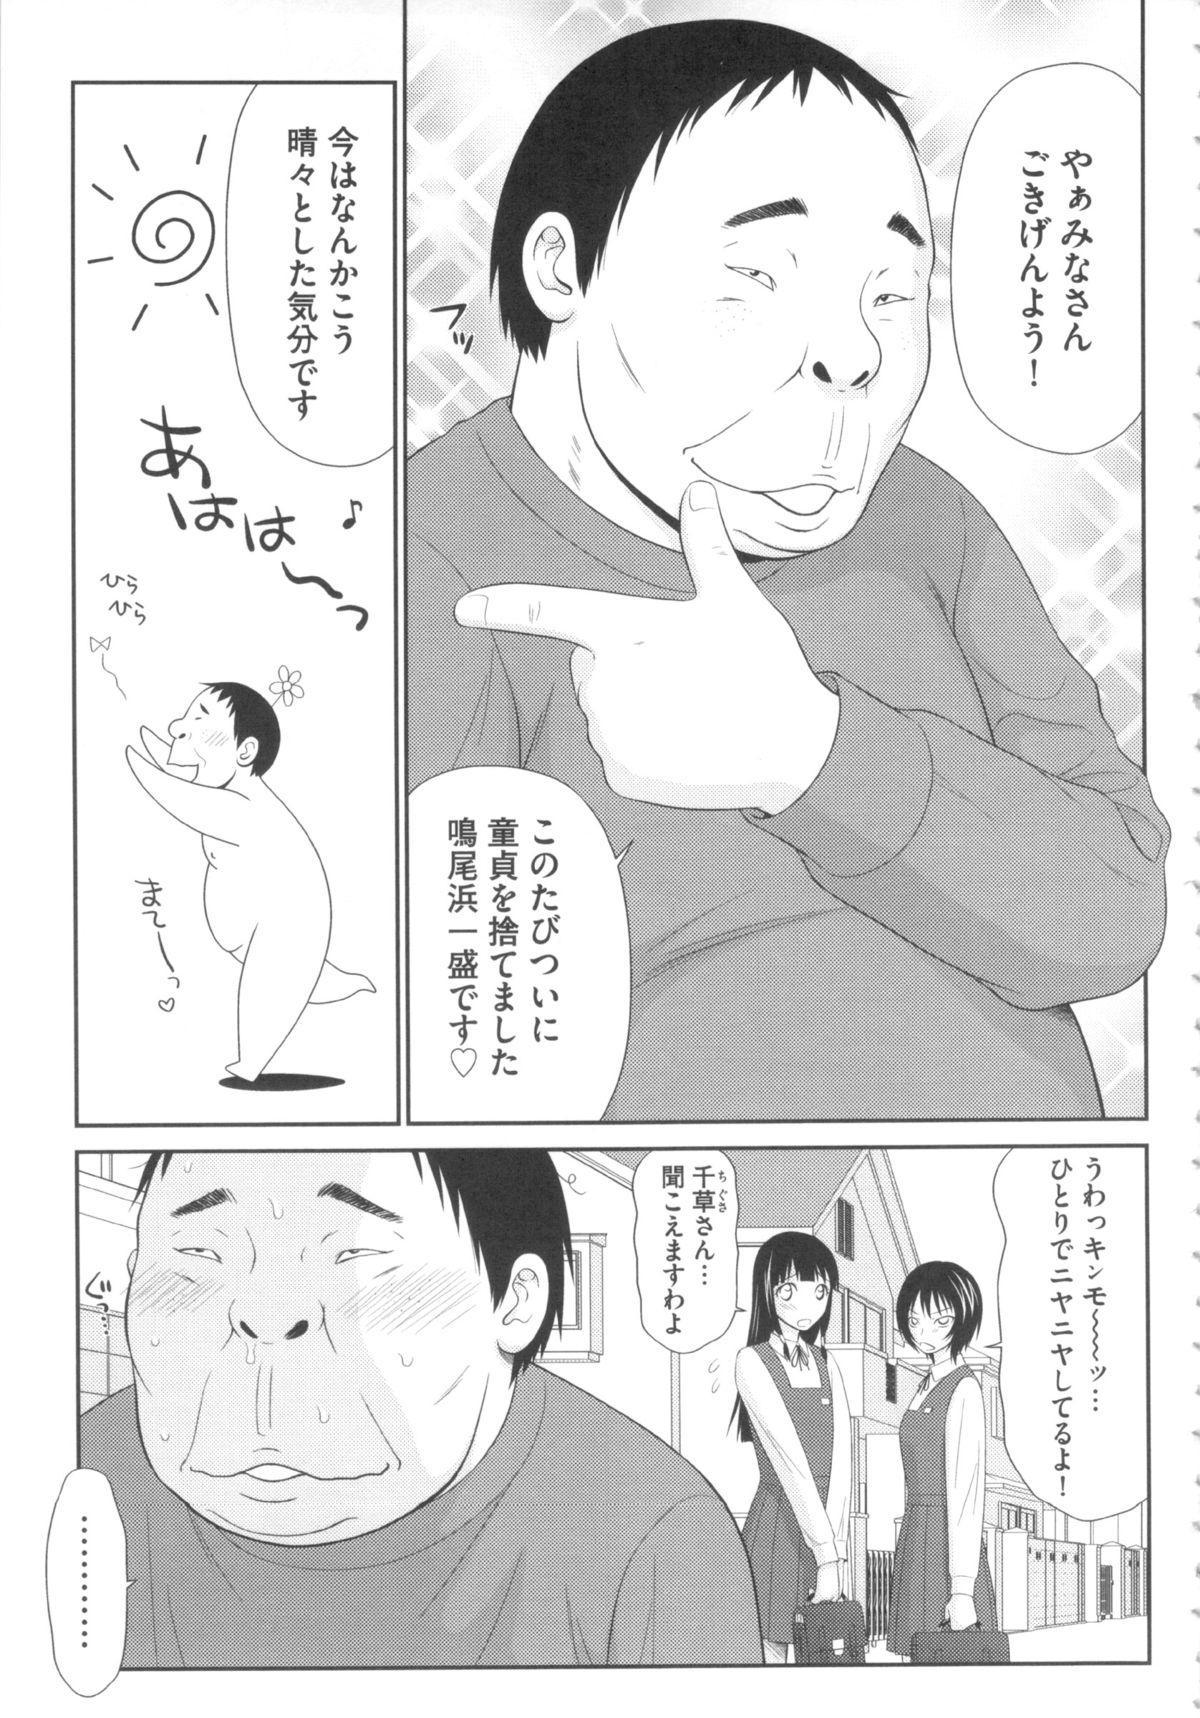 Kiseki No Zaajiru - Sperm of Miracle 25